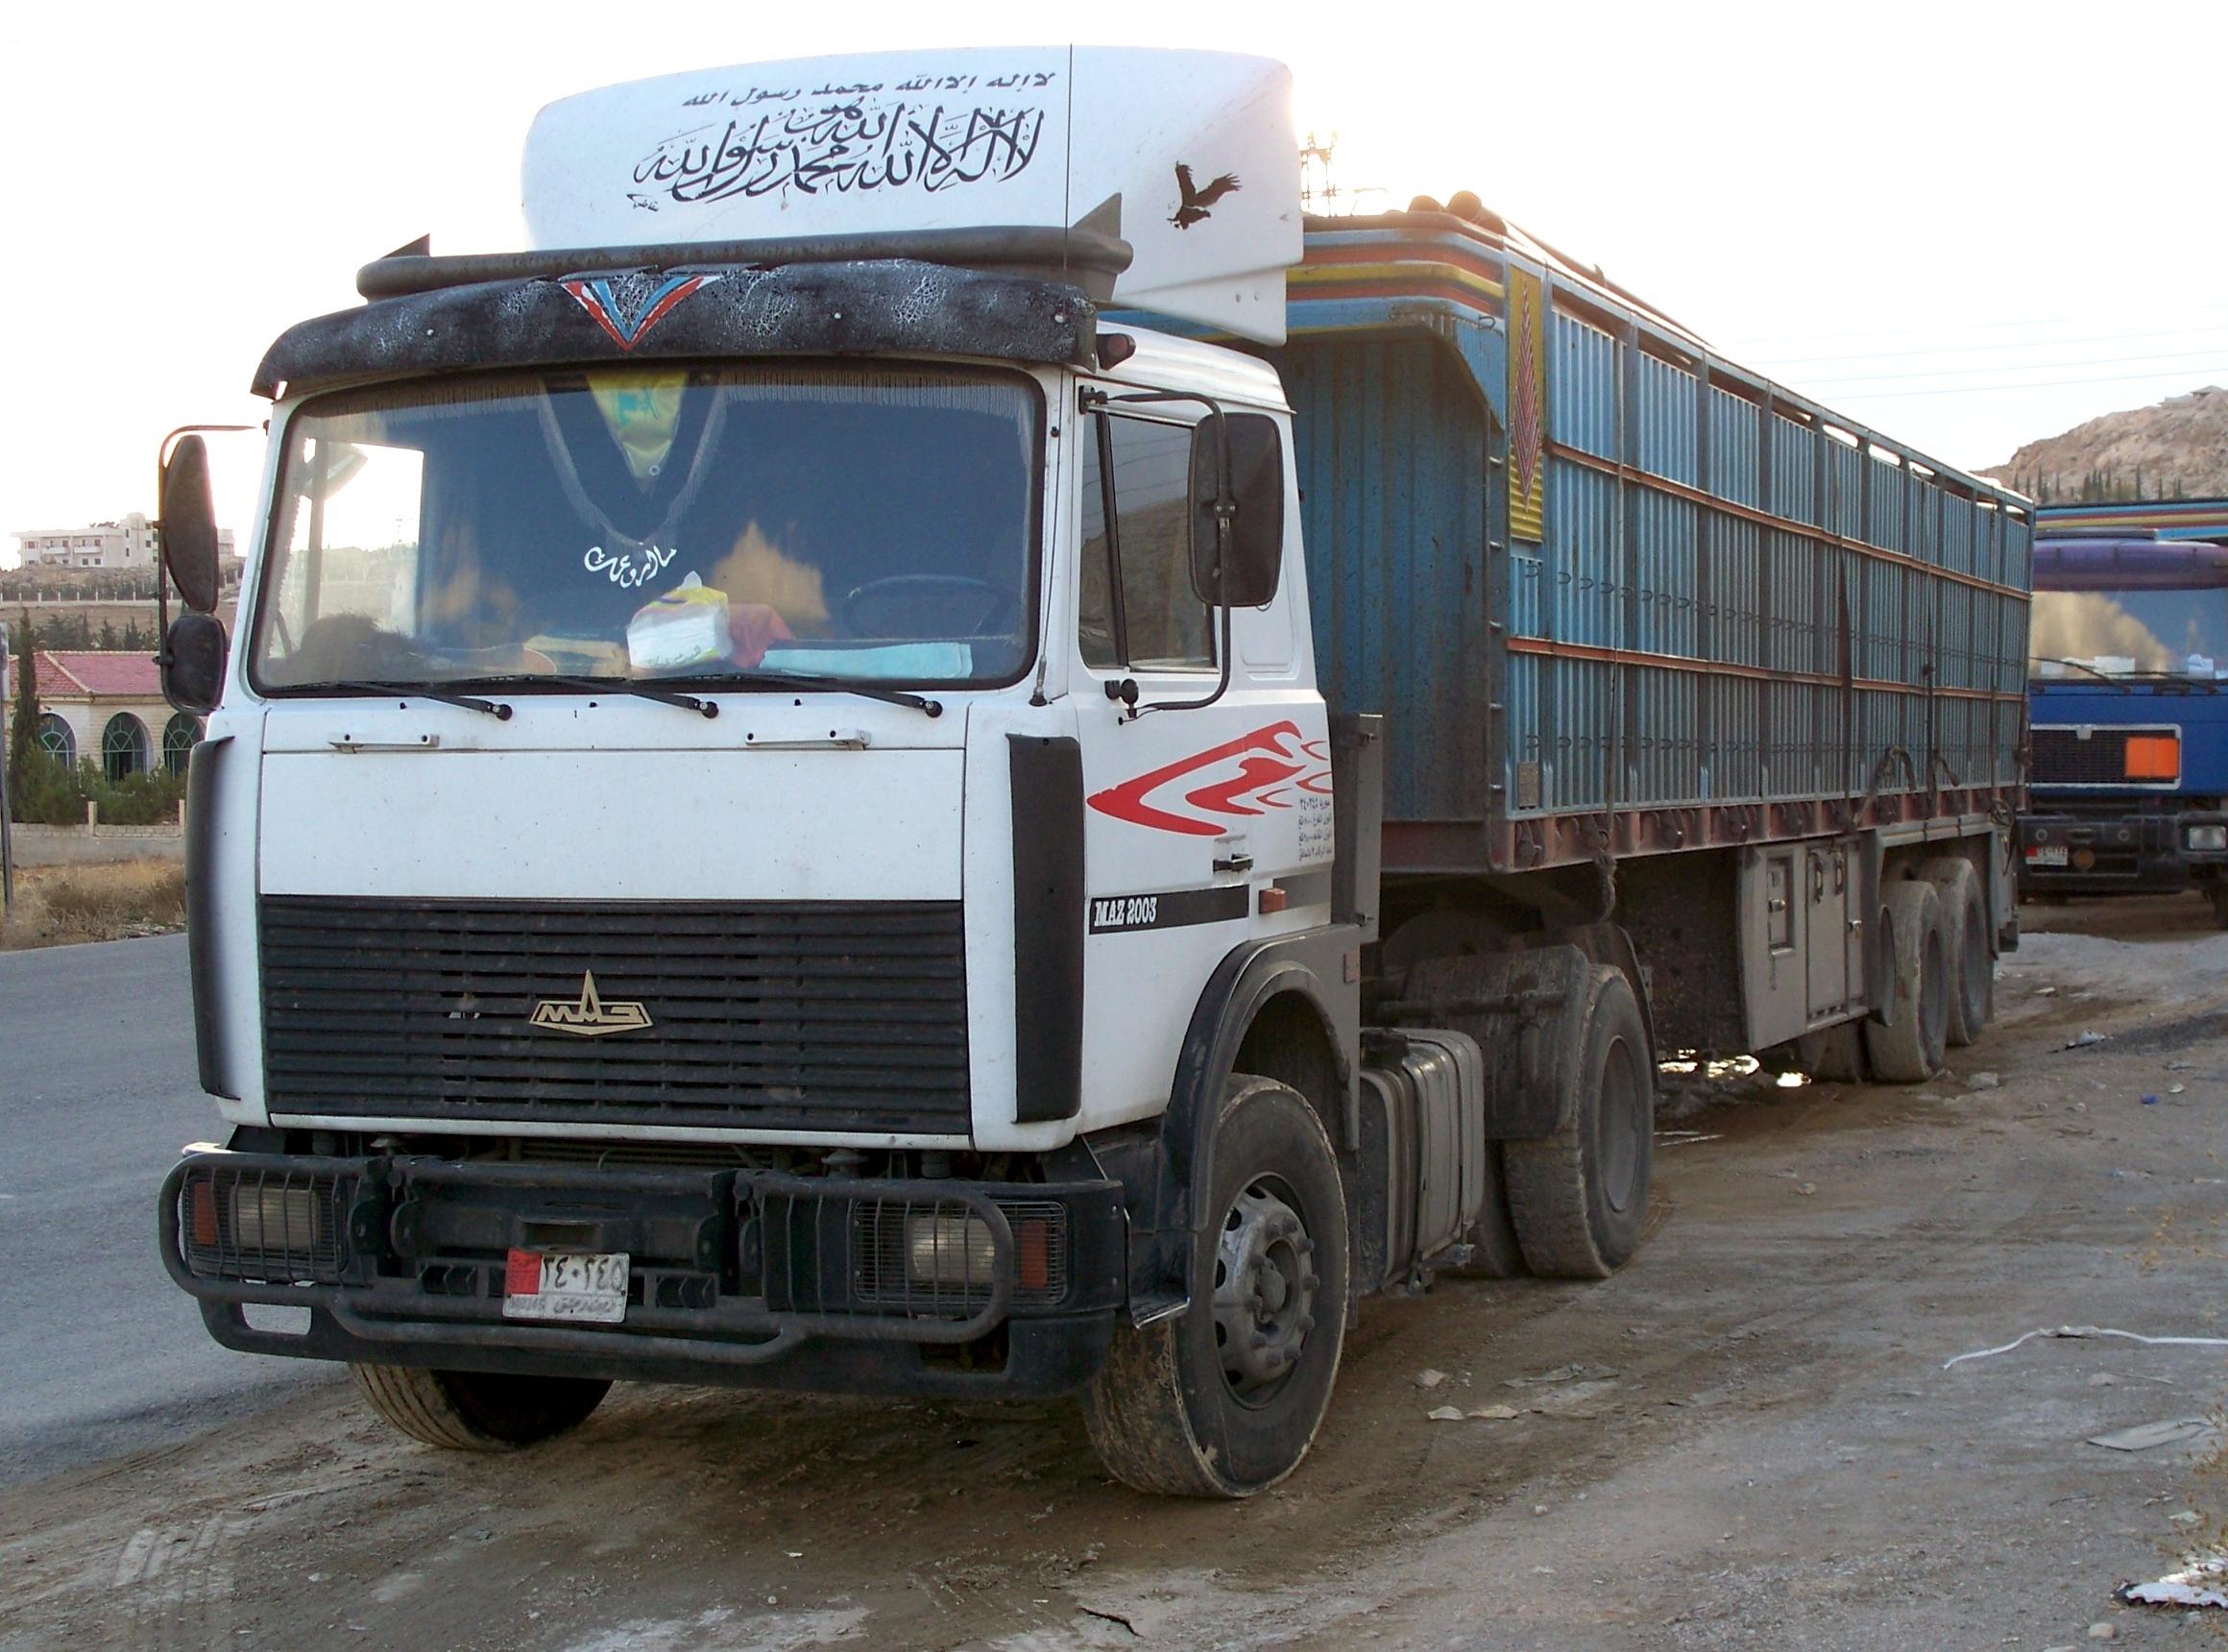 A humantarian aid lorry in Syria.